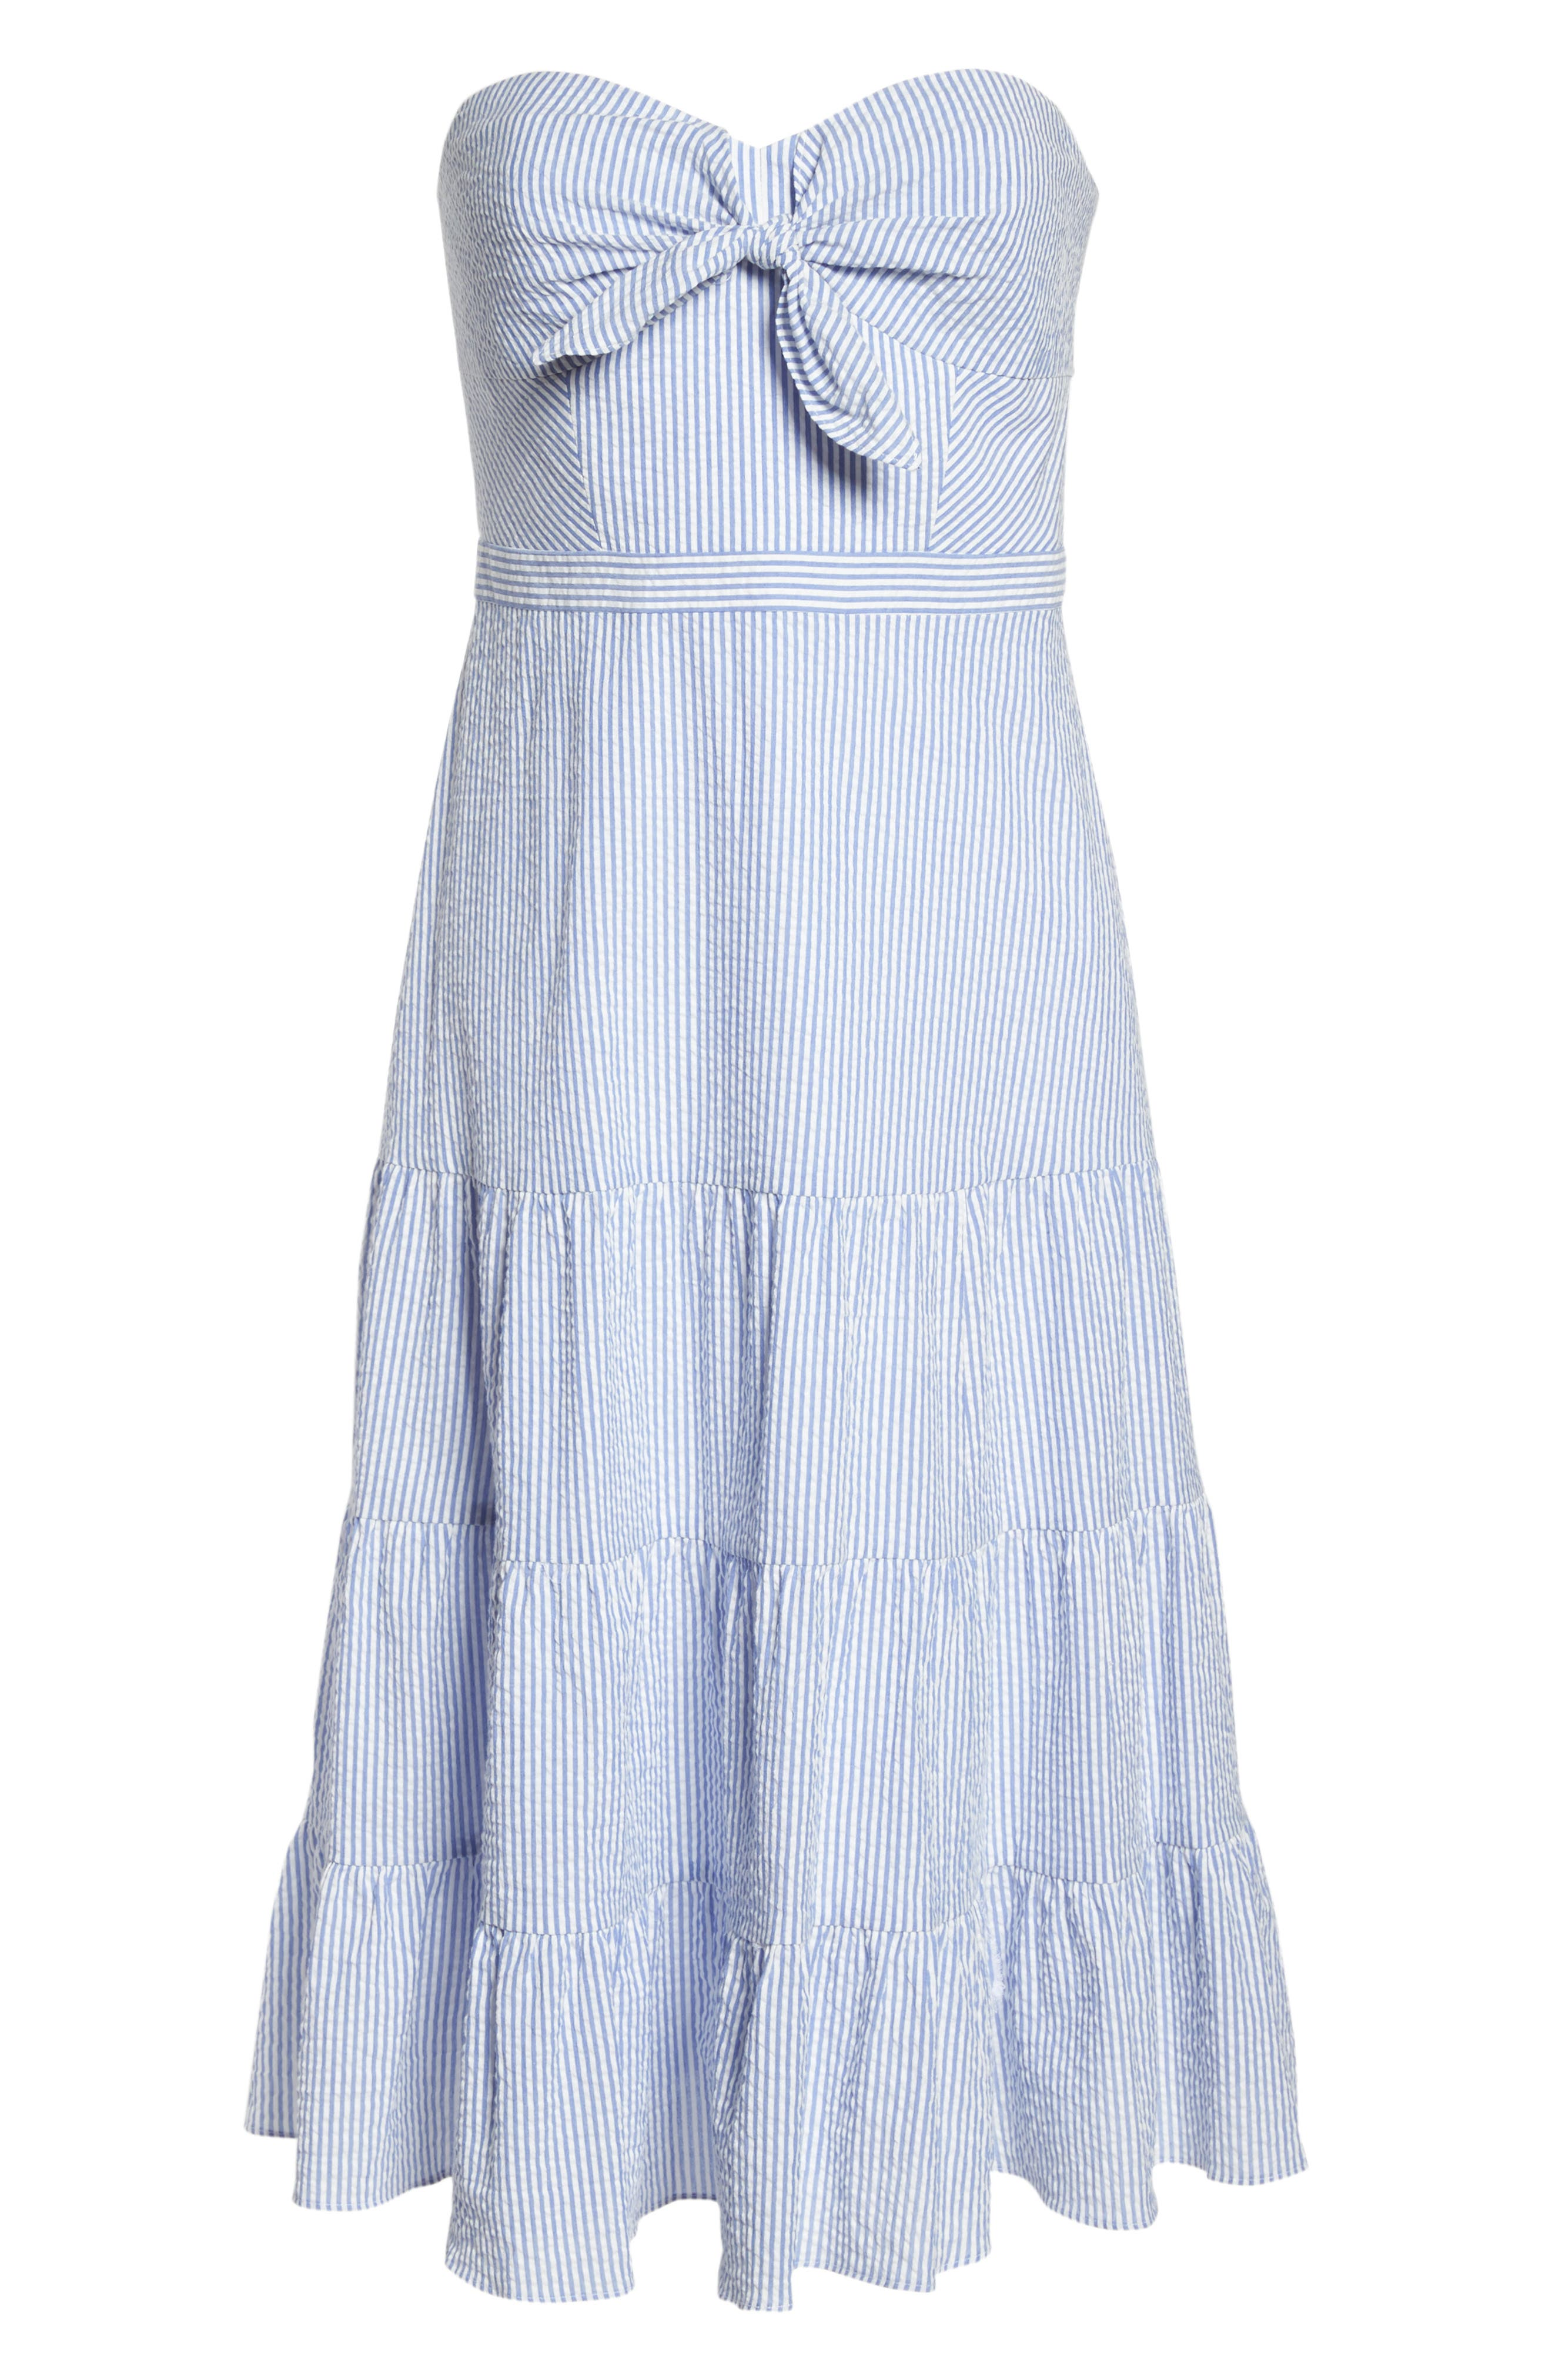 Tie Front Strapless Dress,                             Alternate thumbnail 7, color,                             401